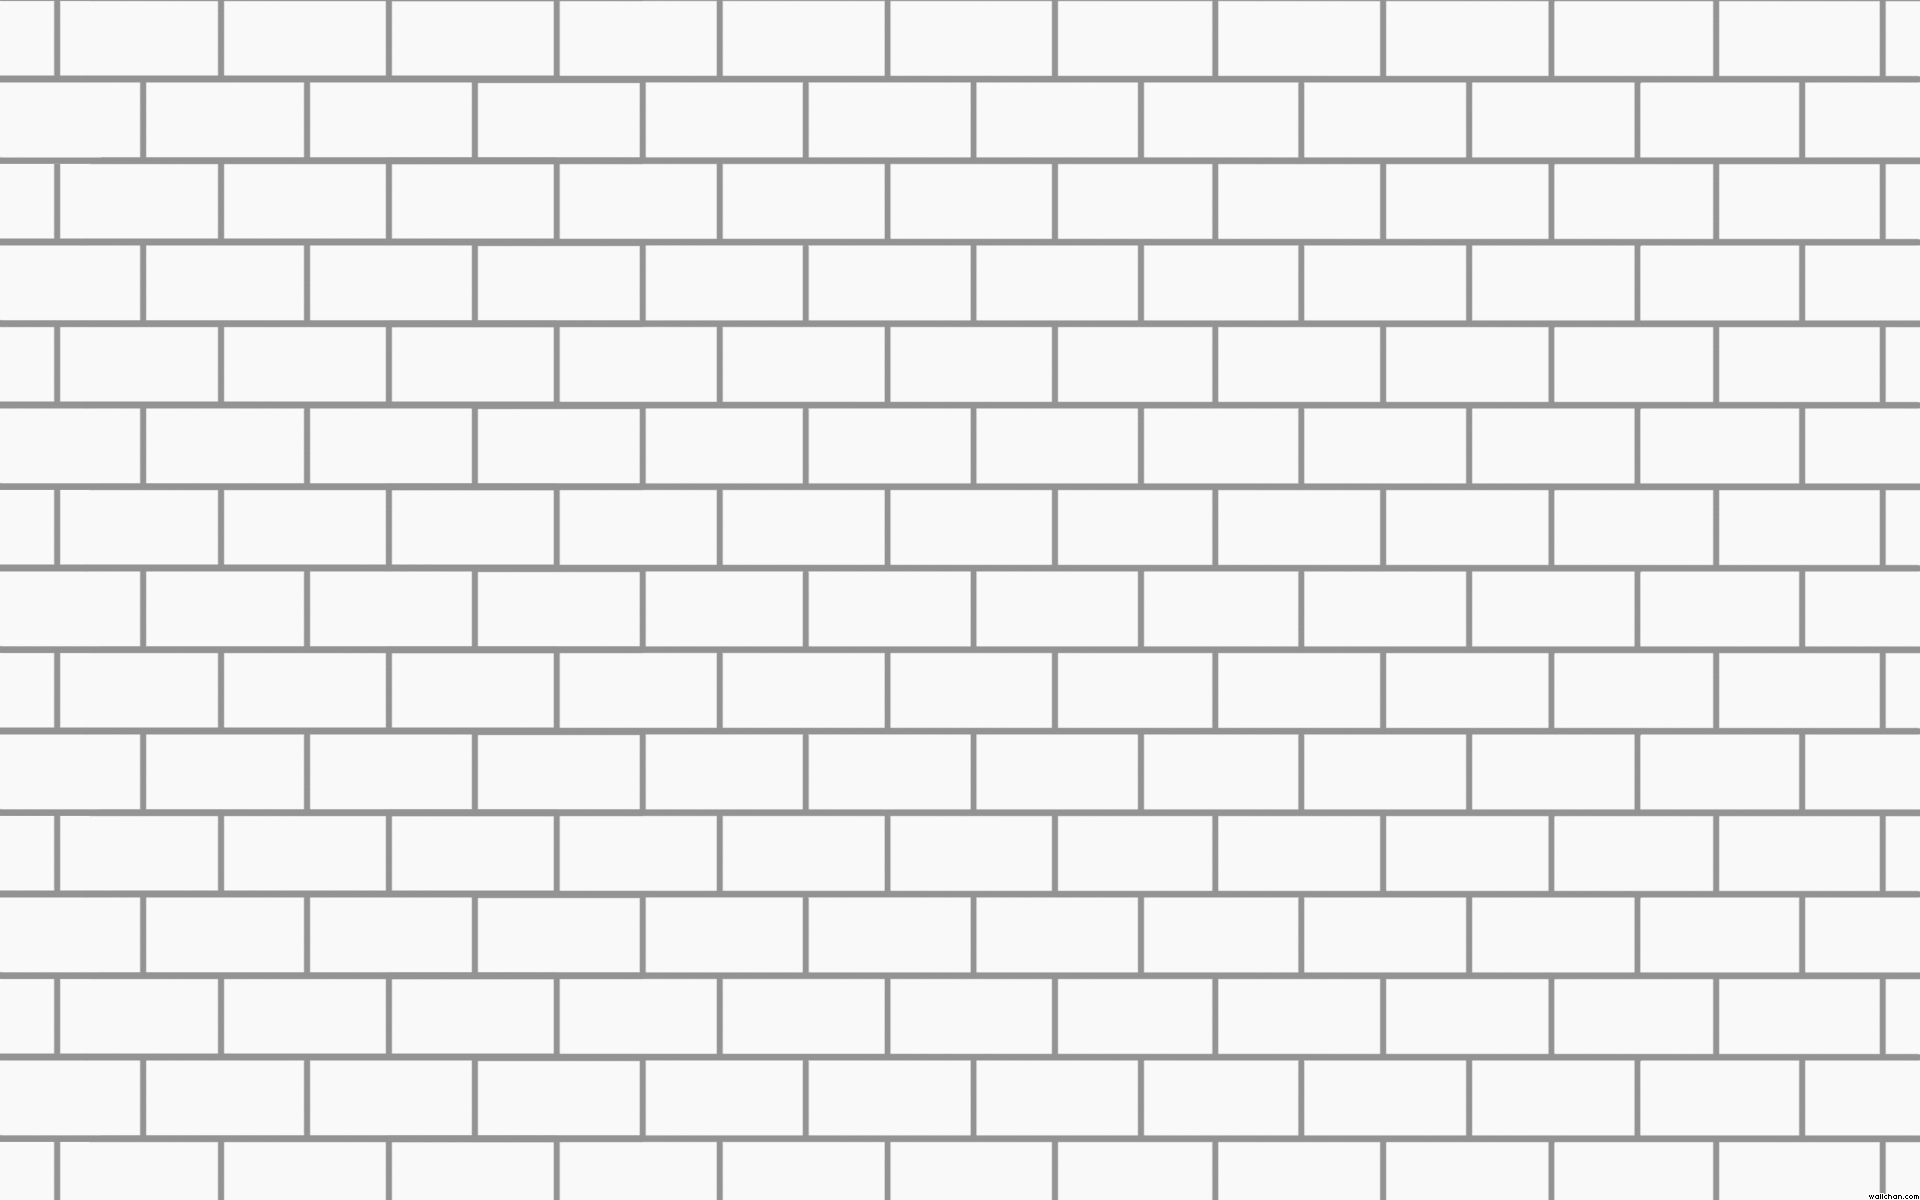 49+] The Wall Wallpaper on WallpaperSafari